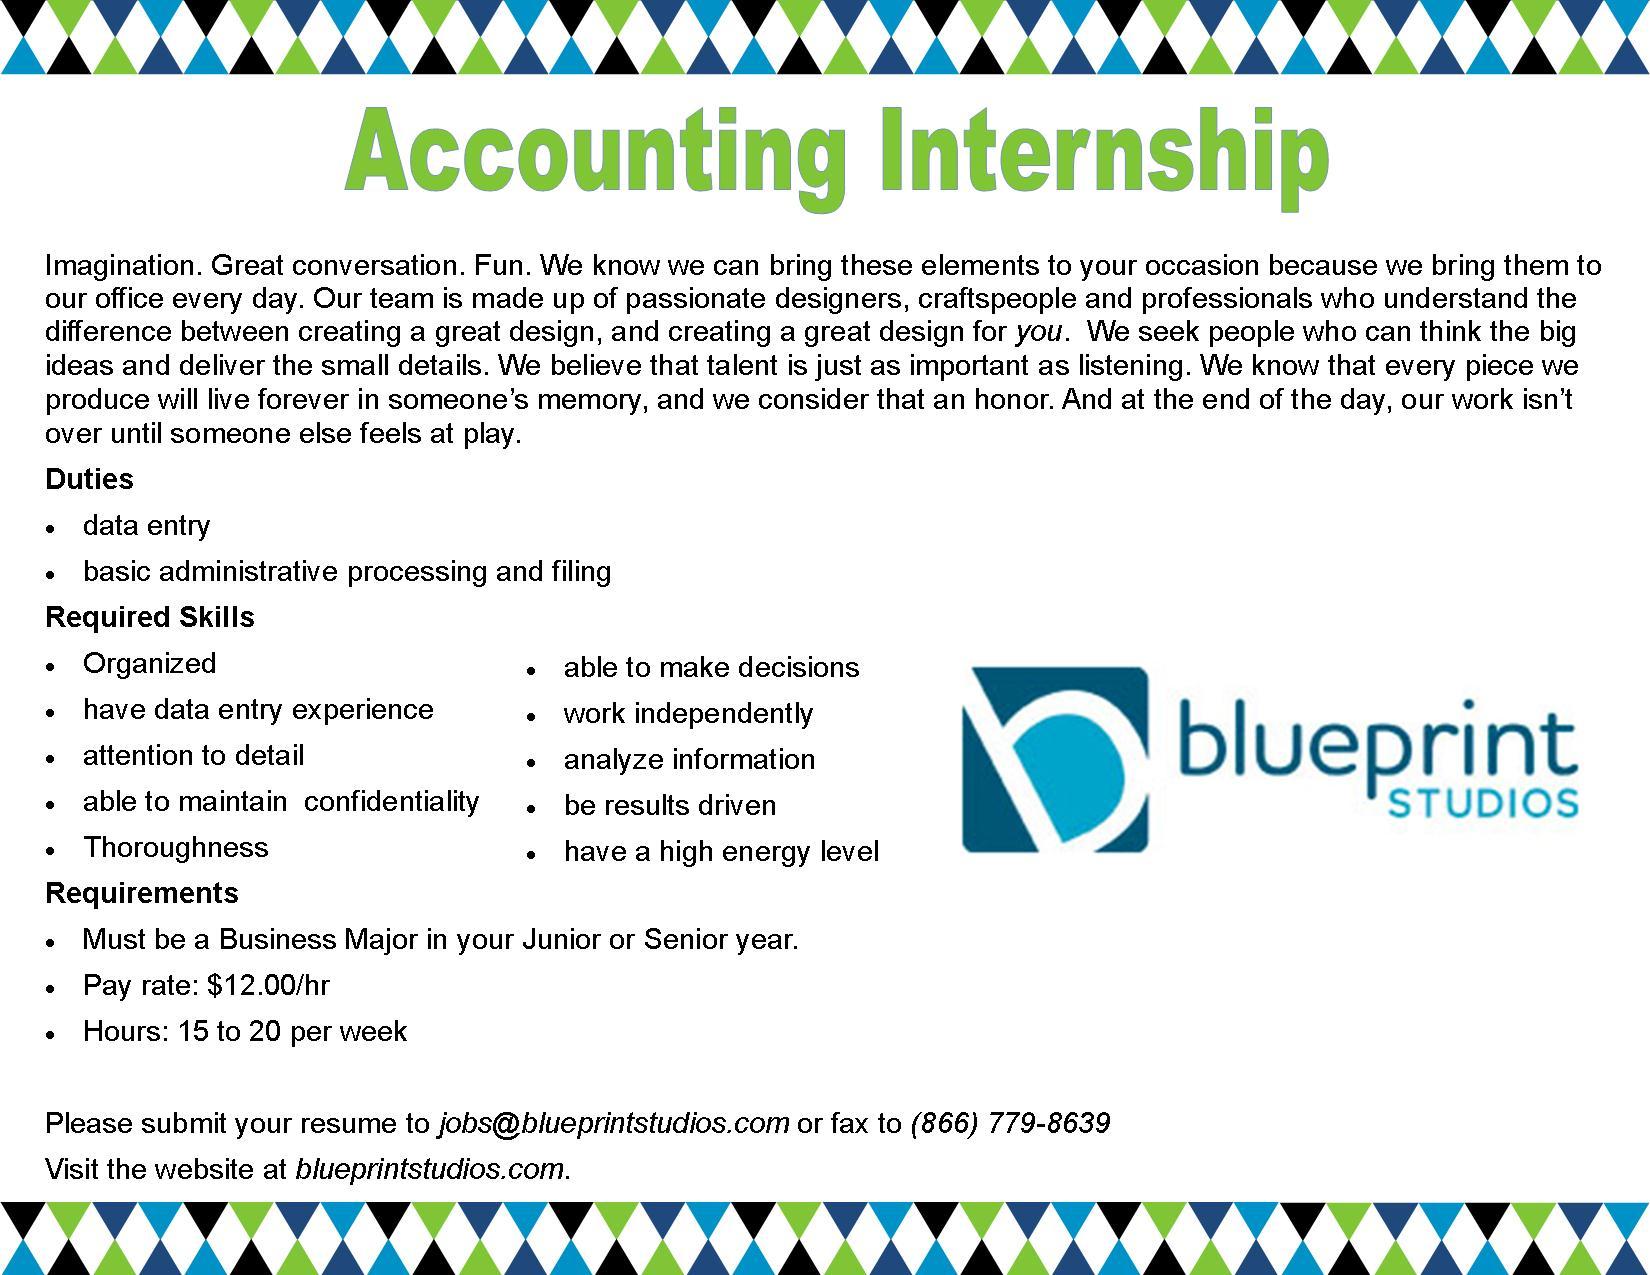 Accounting internship blueprint studios career corner blueprint studios malvernweather Gallery